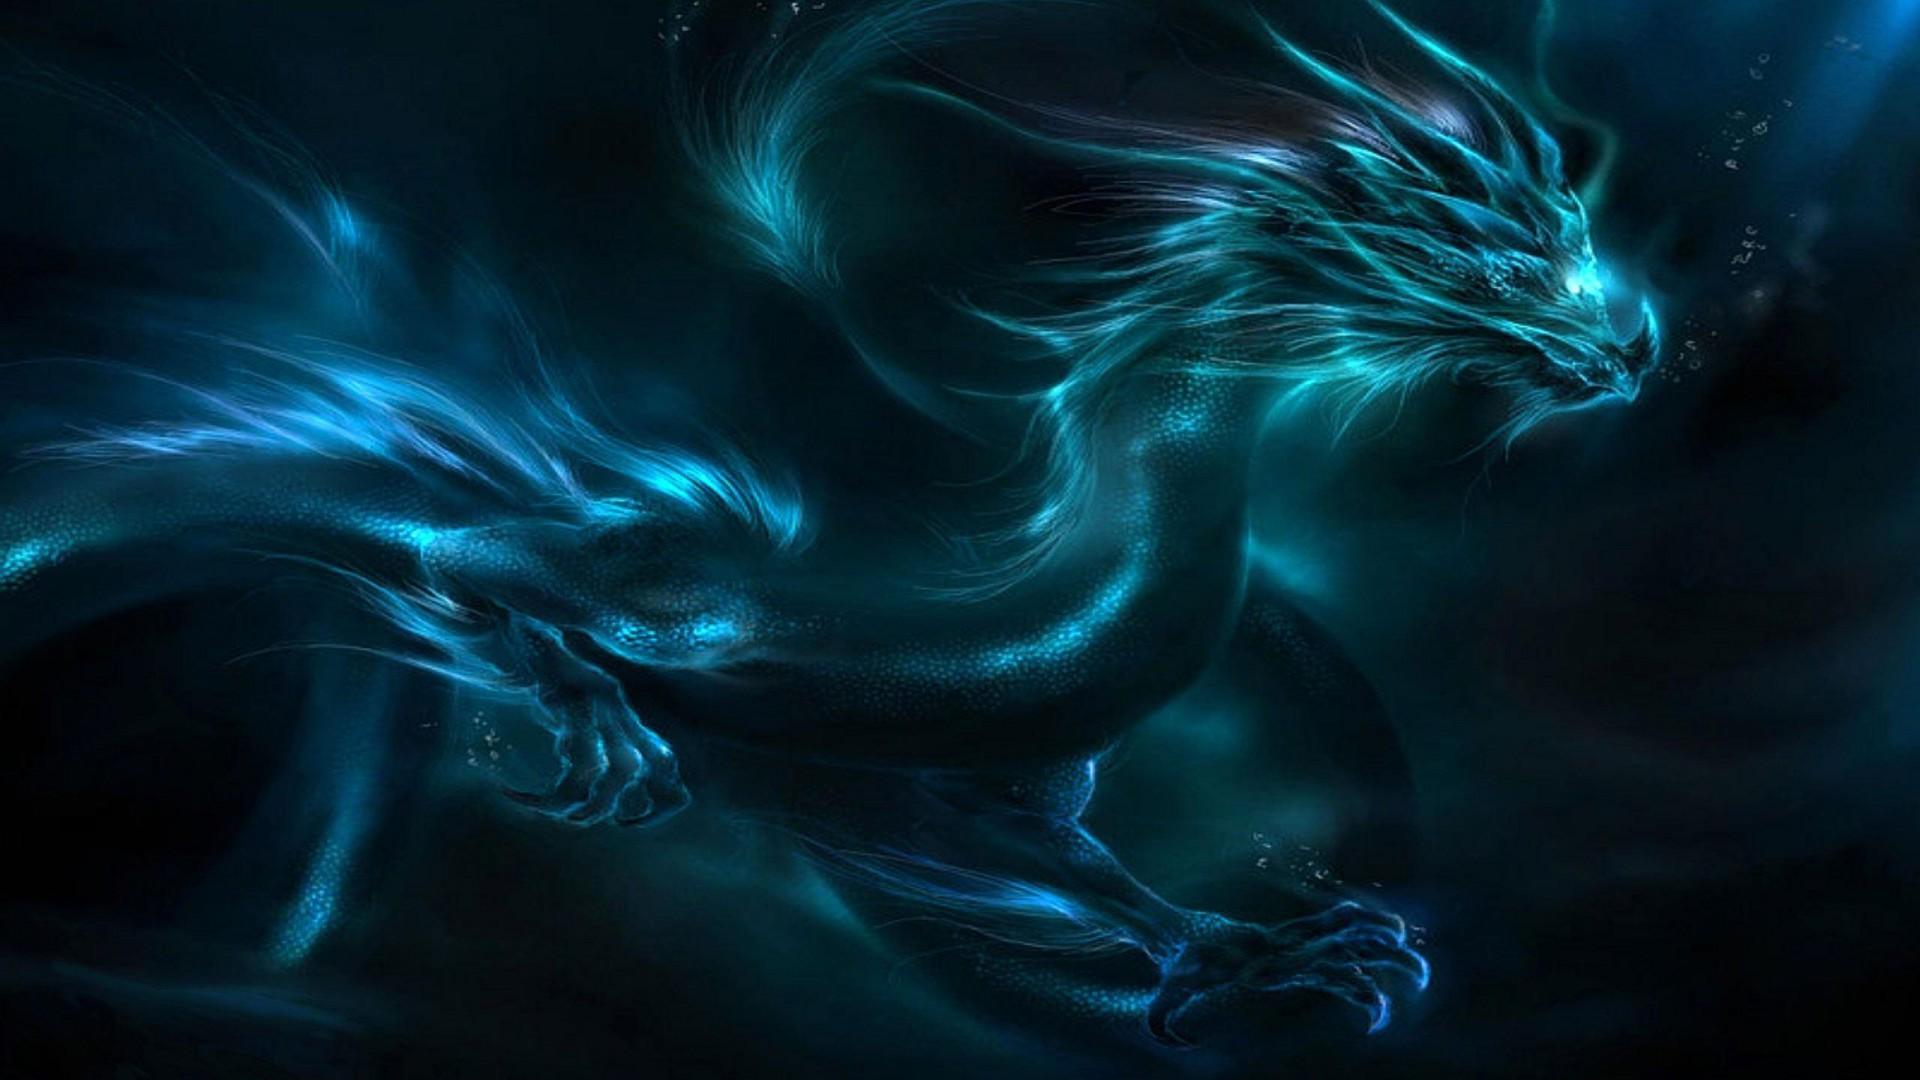 Full Fantasy Blue Dragon Wallpaper 1920x1080 Full HD Wallpapers 1920x1080